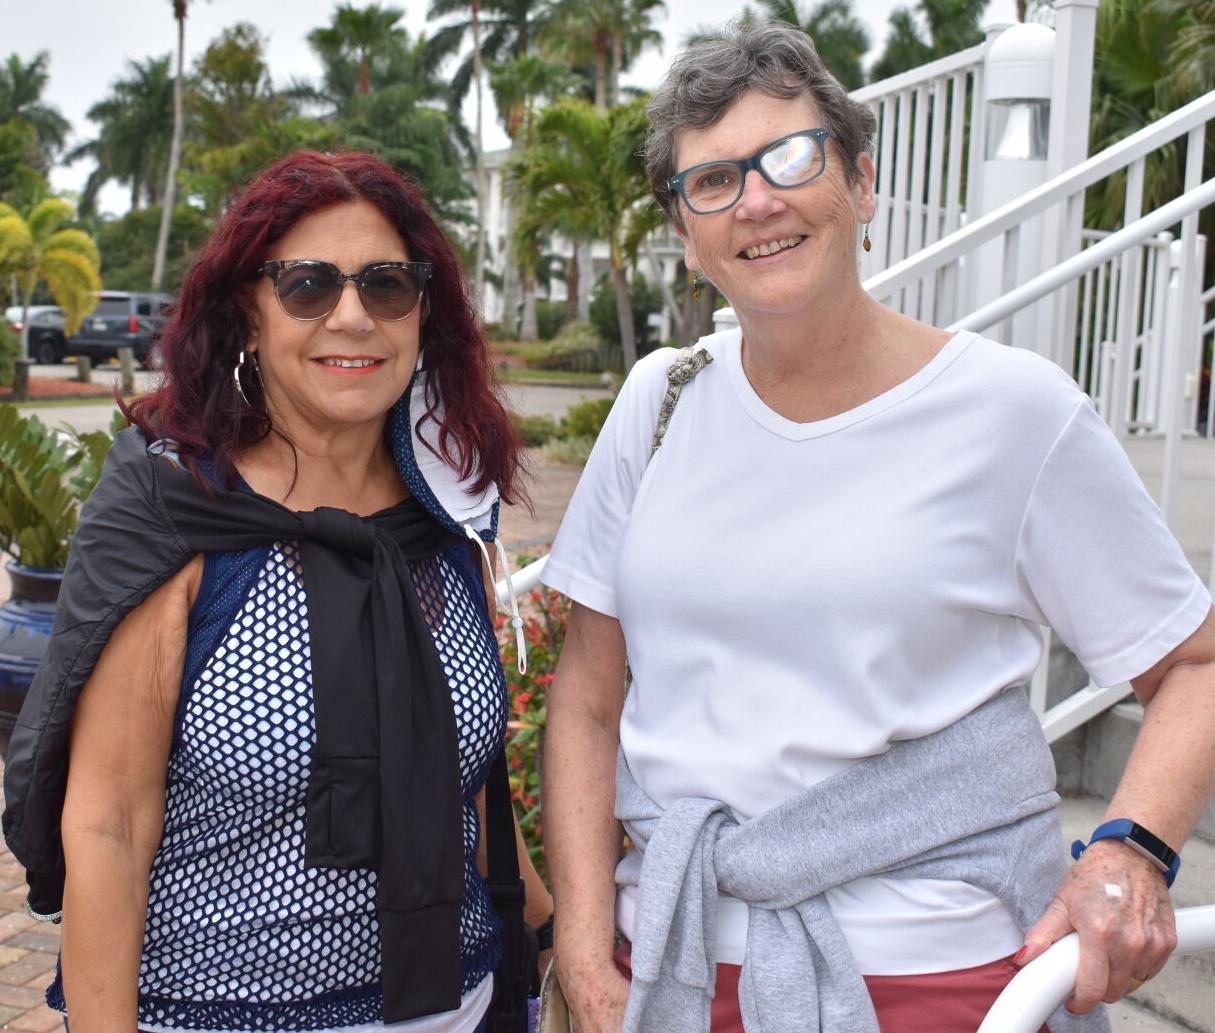 Miriam Mendoza (left) and Kathy Tapogna